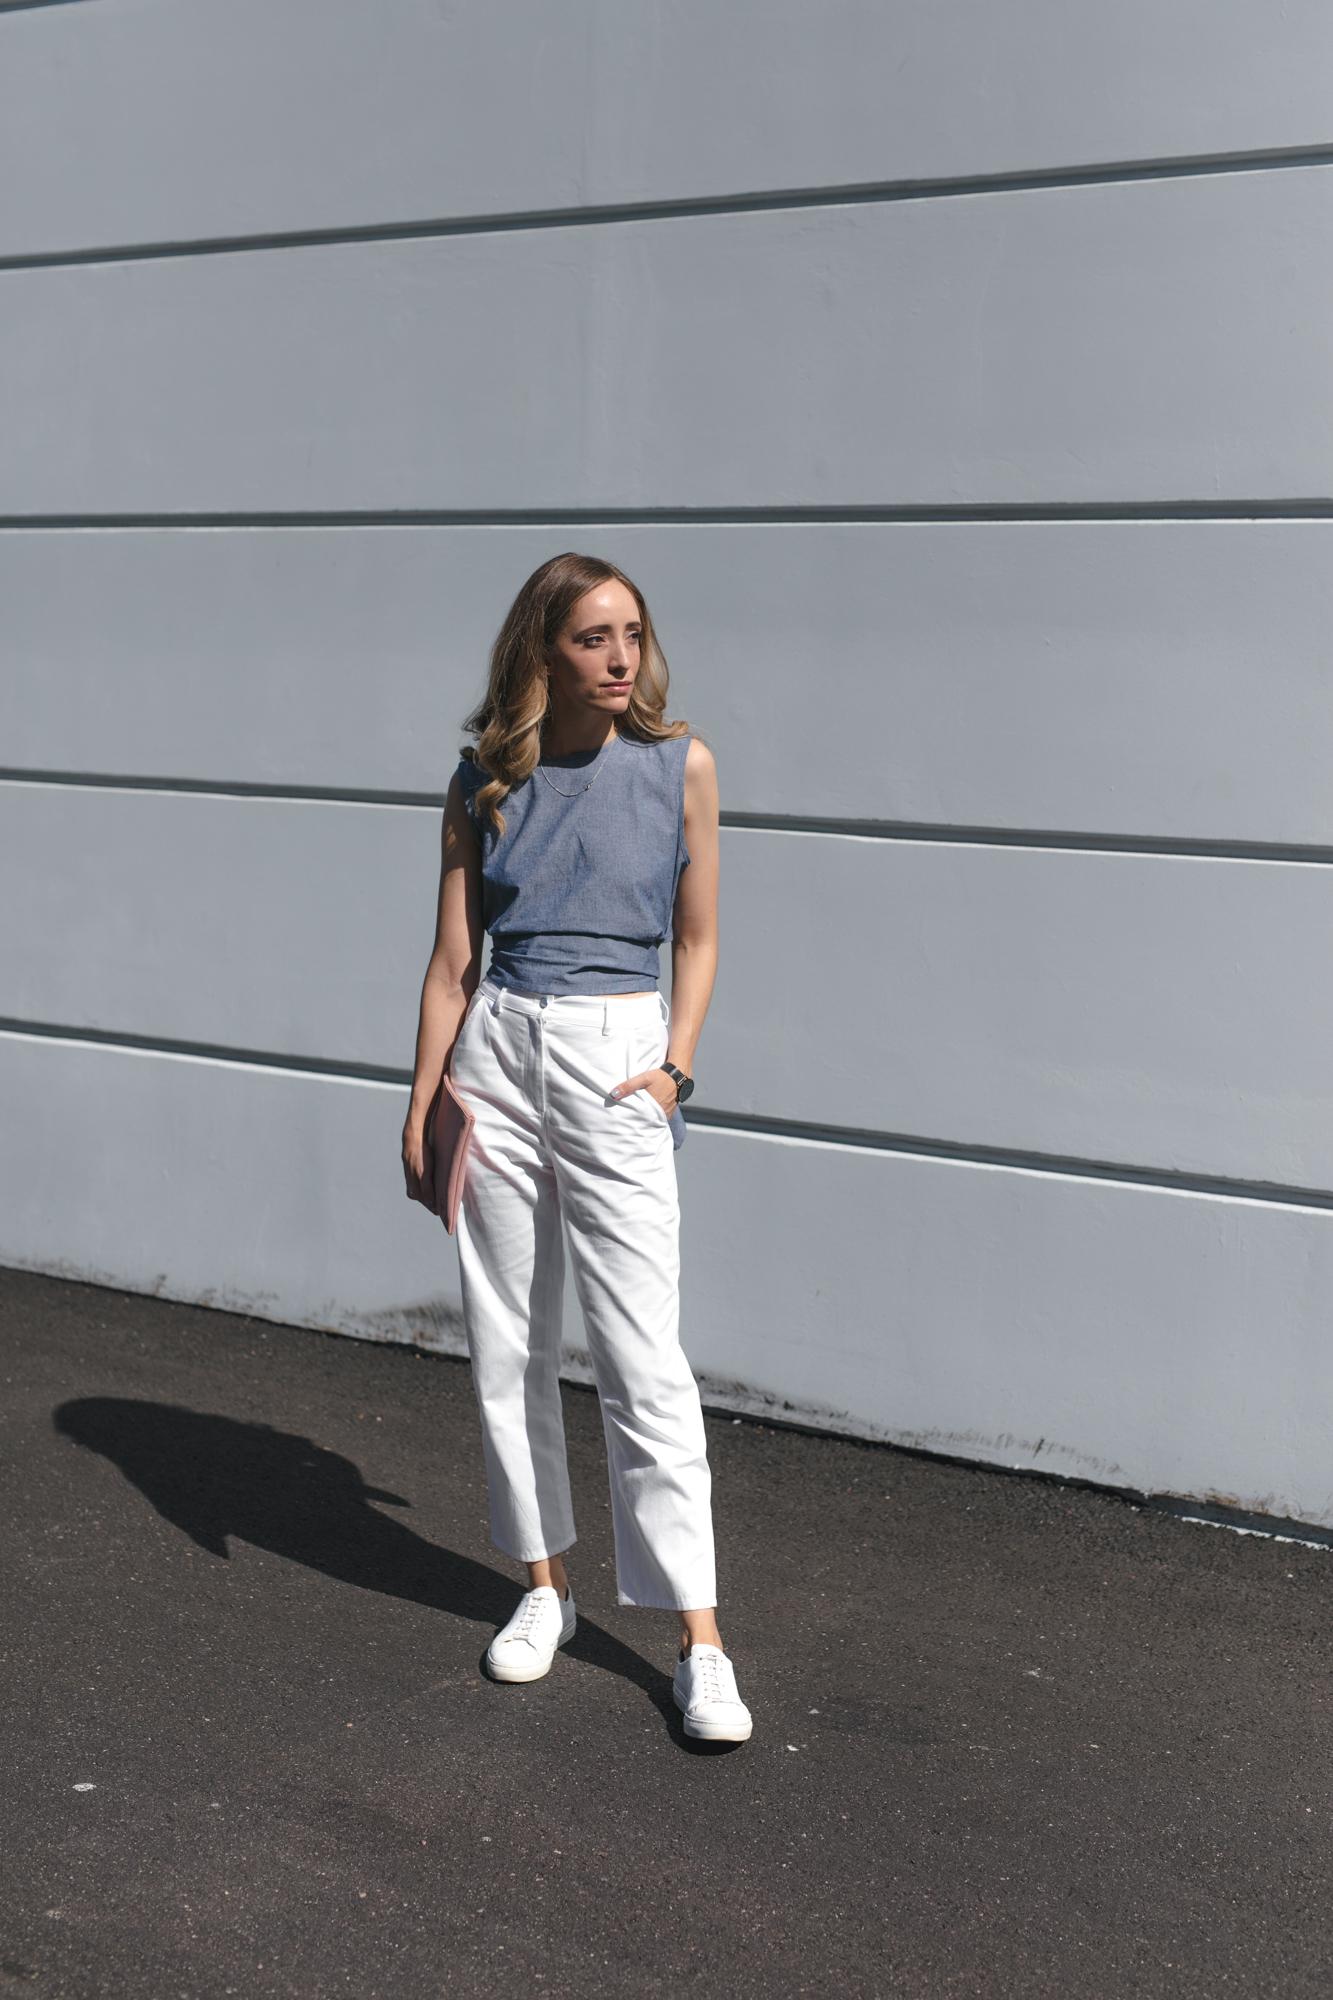 sharday-engel-toit-volant-herschel-axel-arigato-vancouver-fashion-blogger-mama9099.jpg